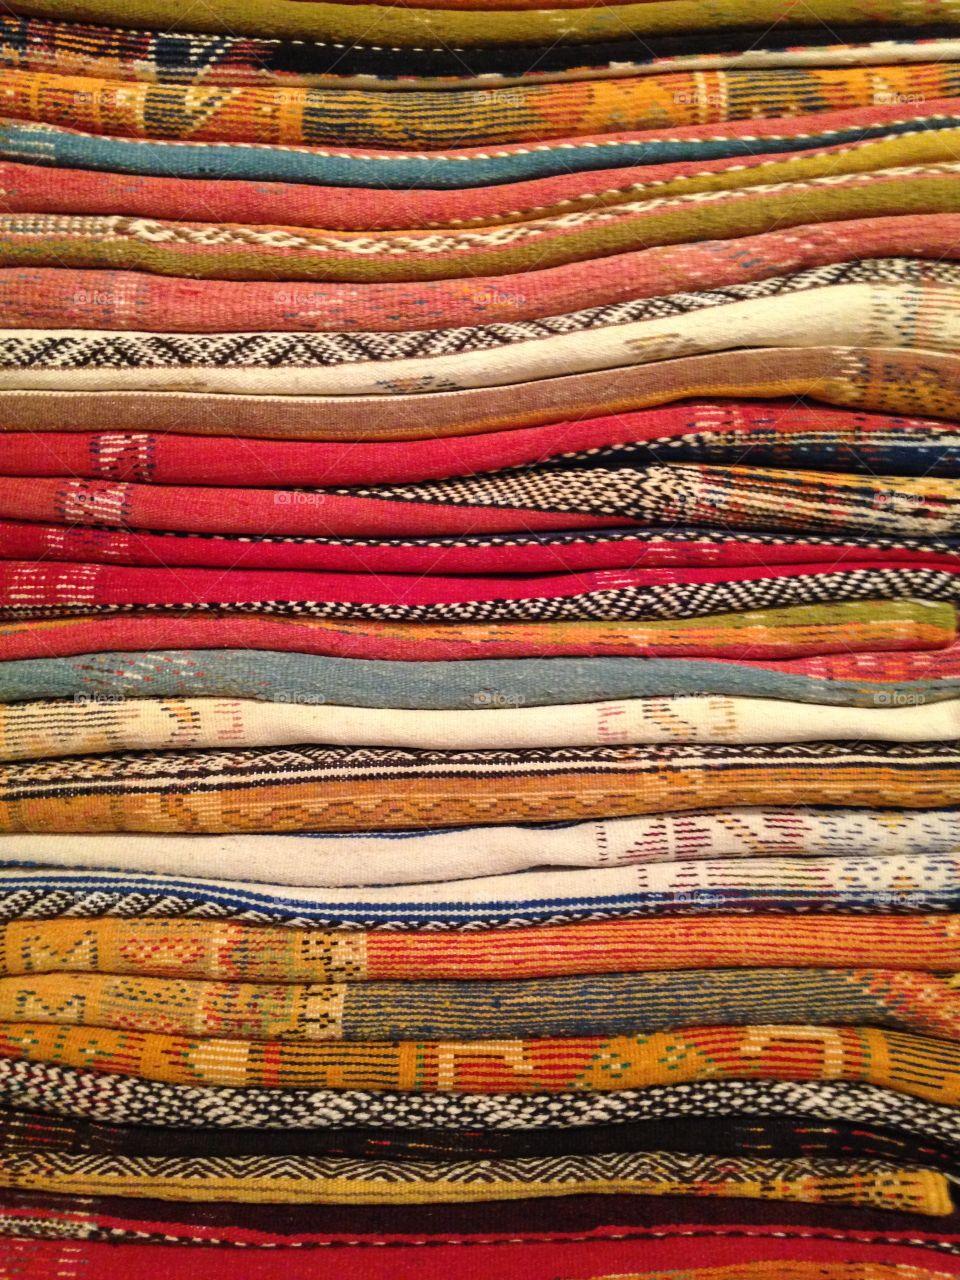 Pile of Antique Rugs in Marrakesh Market